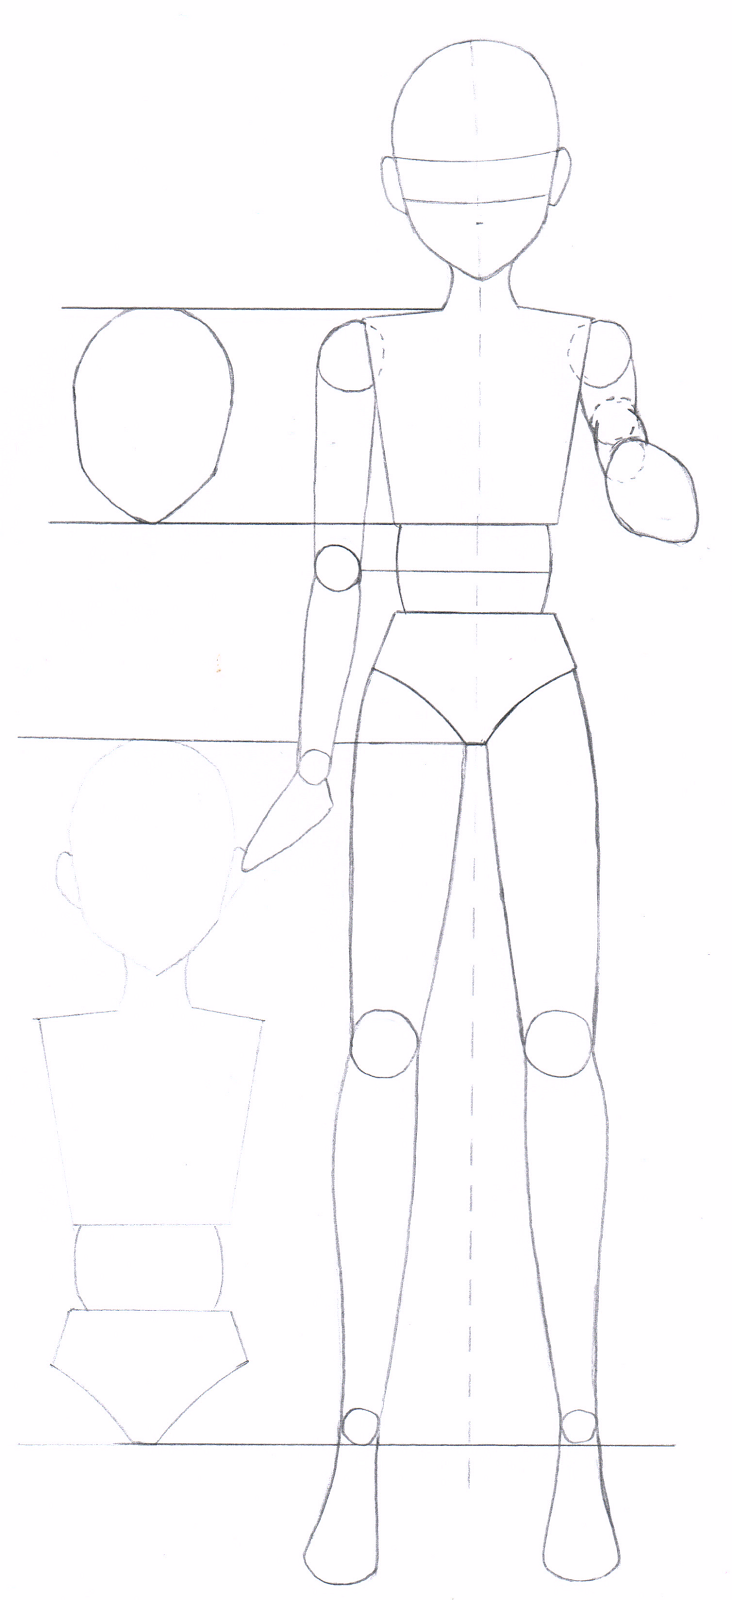 kompletter Körper einer Manga Mädchen | How to draw people, manga ...